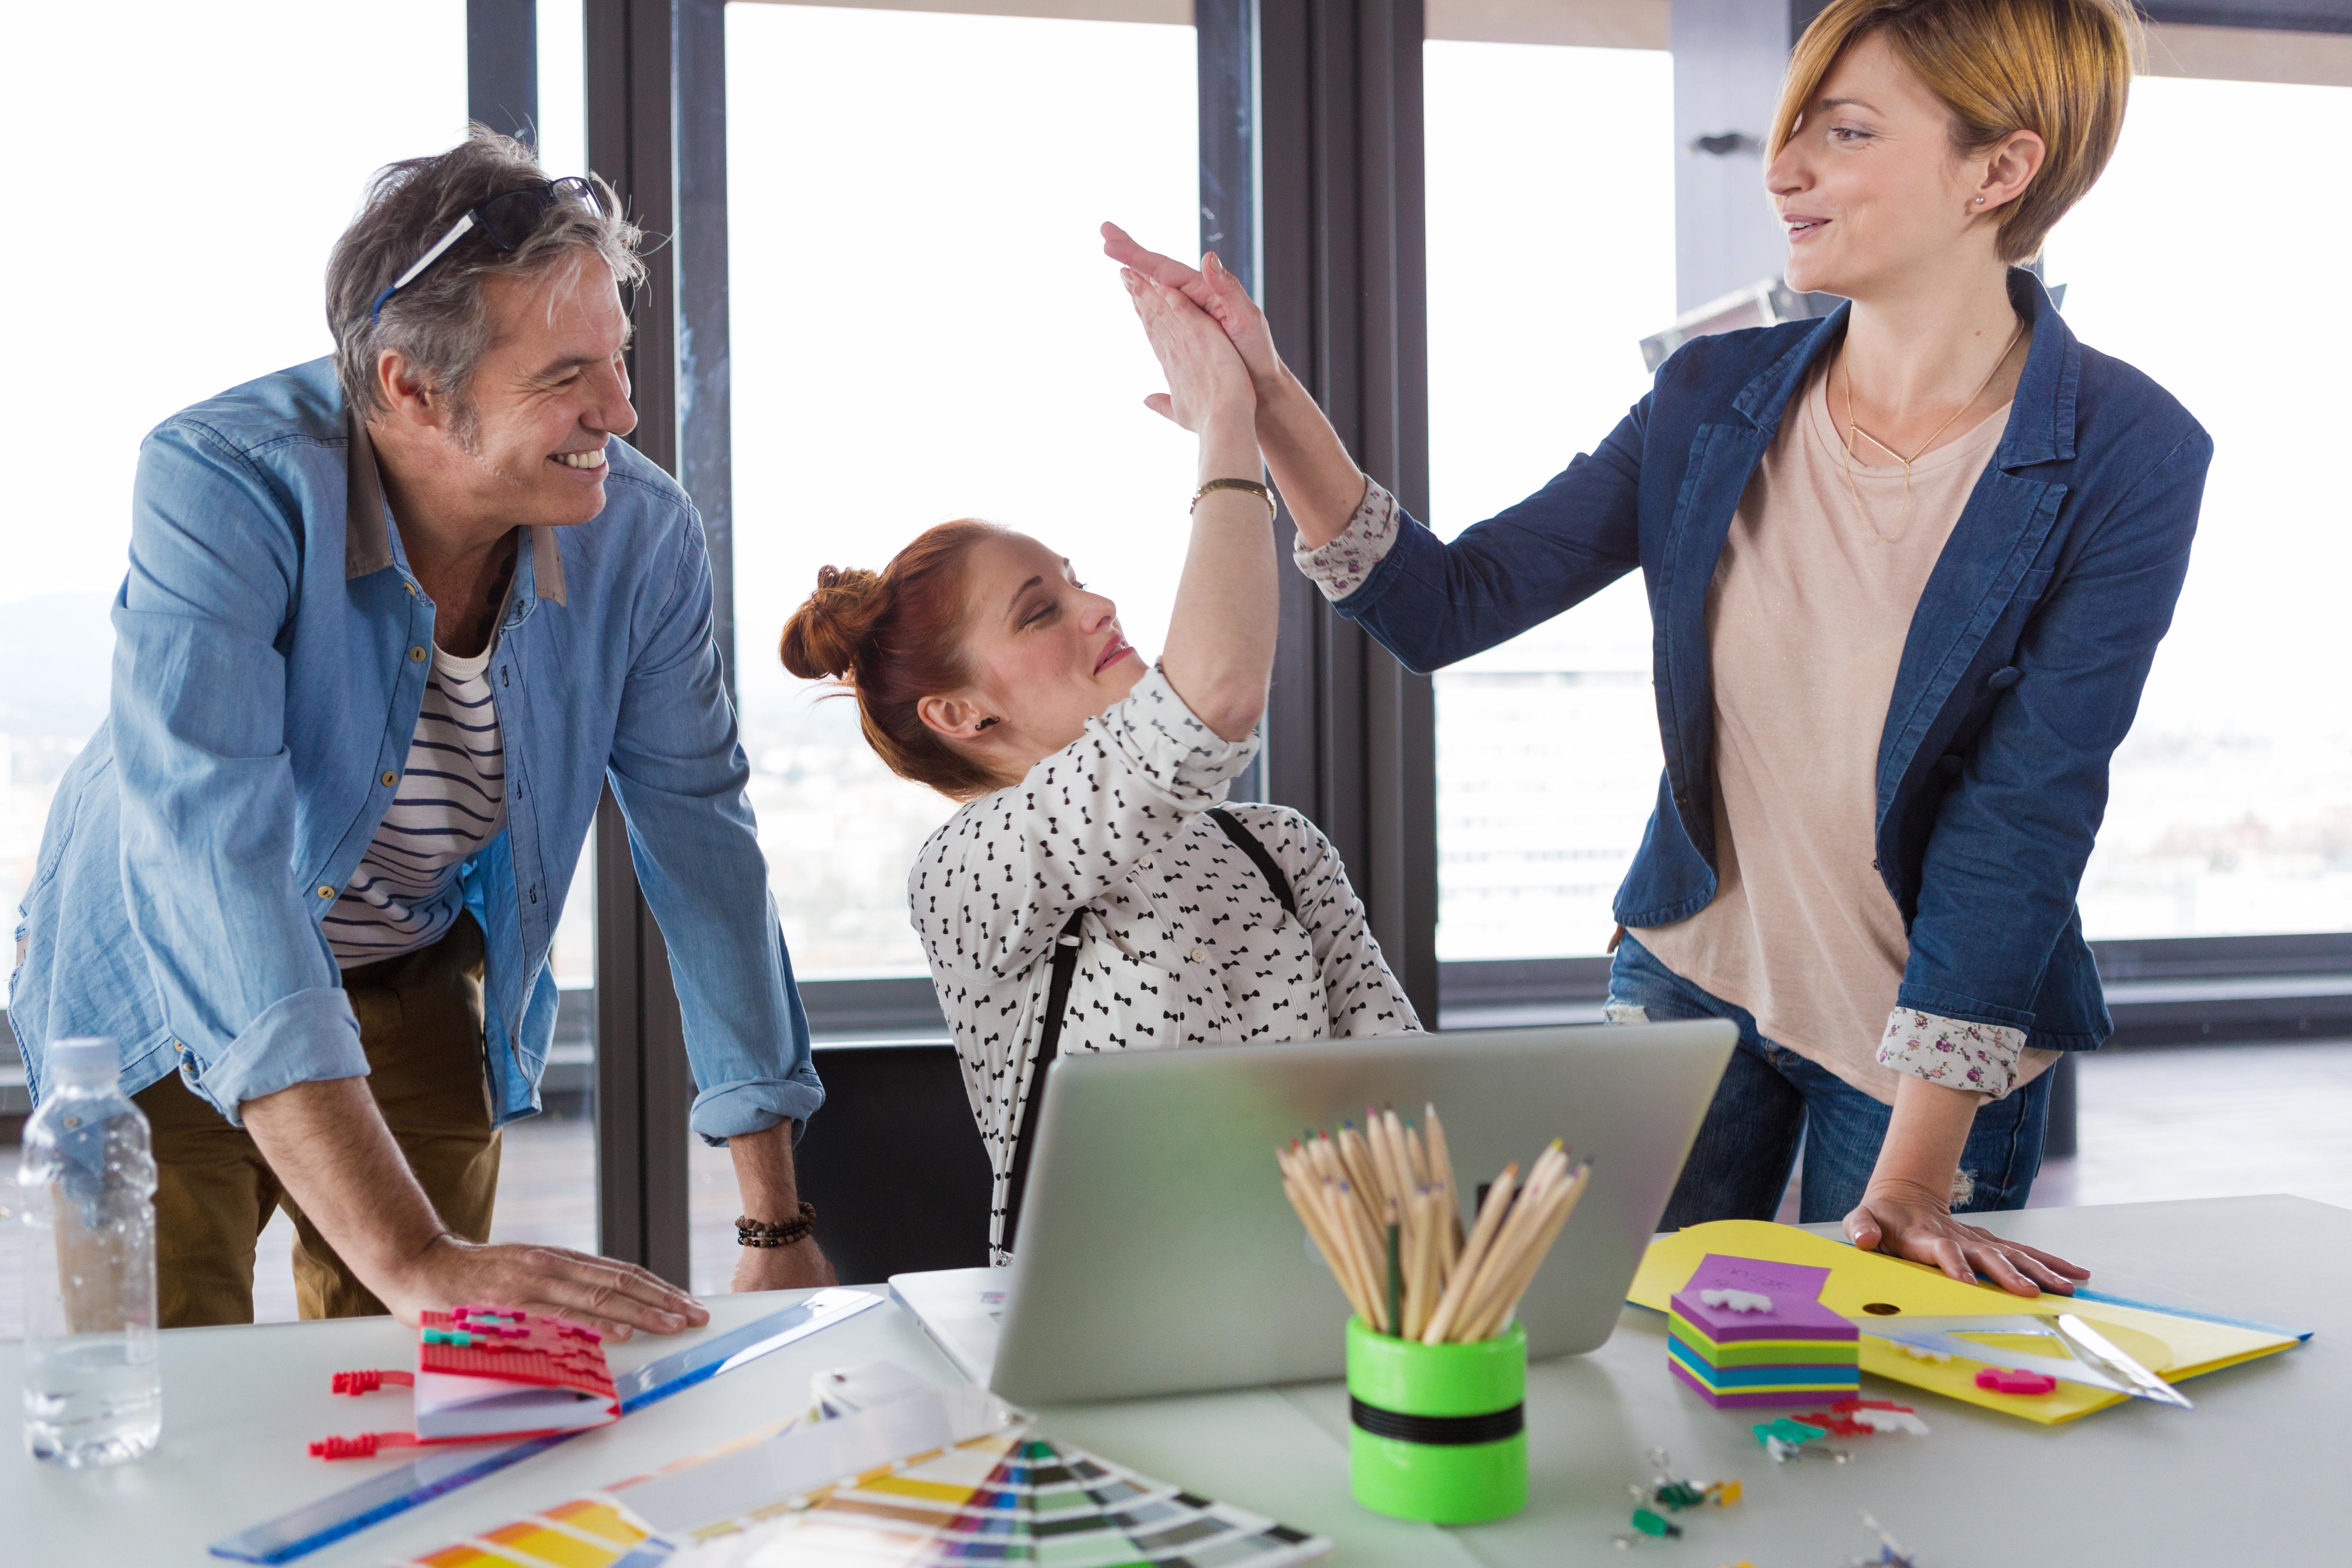 bigstock-Business-people-in-modern-offi-119533232-1